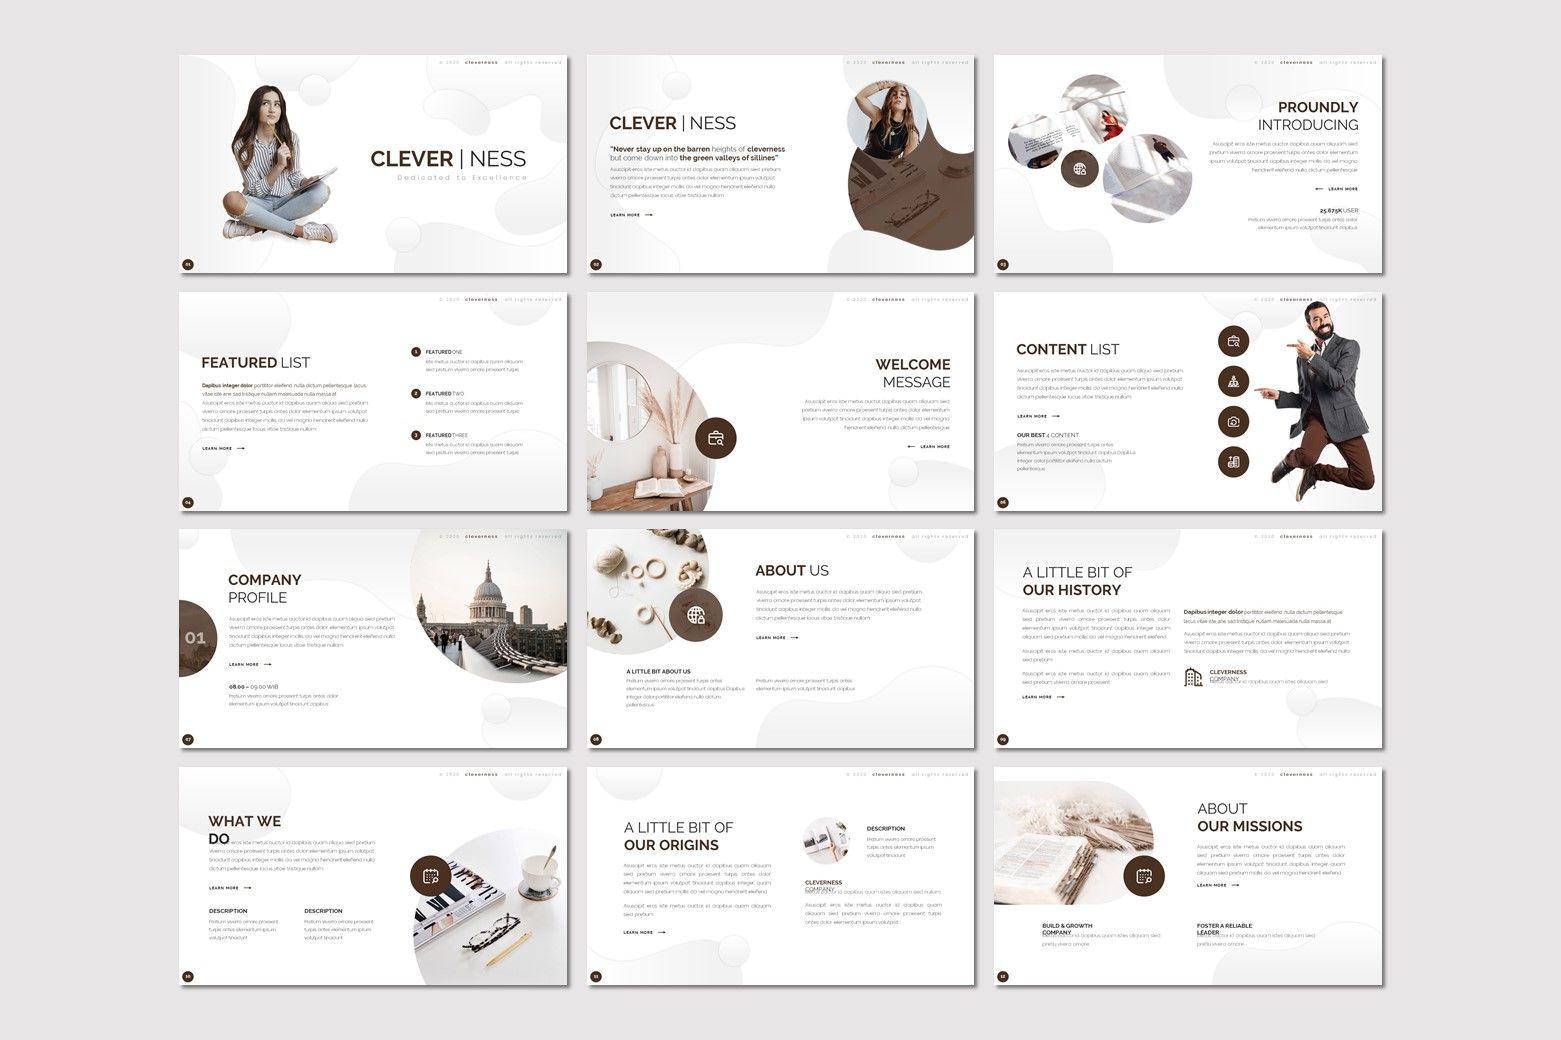 Clevernes - Google Slides Template, Slide 2, 07784, Presentation Templates — PoweredTemplate.com